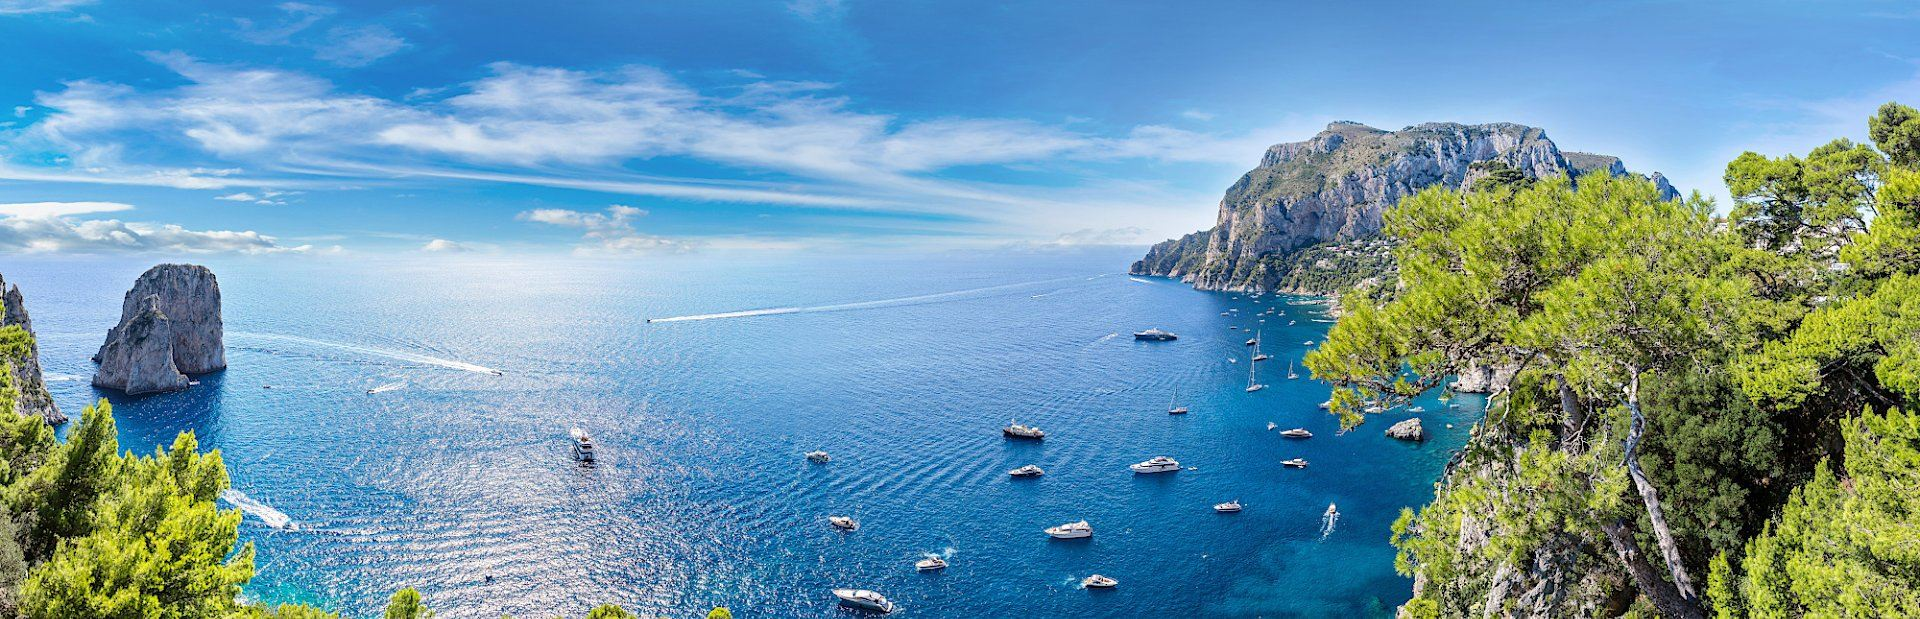 Luxury Yacht Charter Amalfi Coast